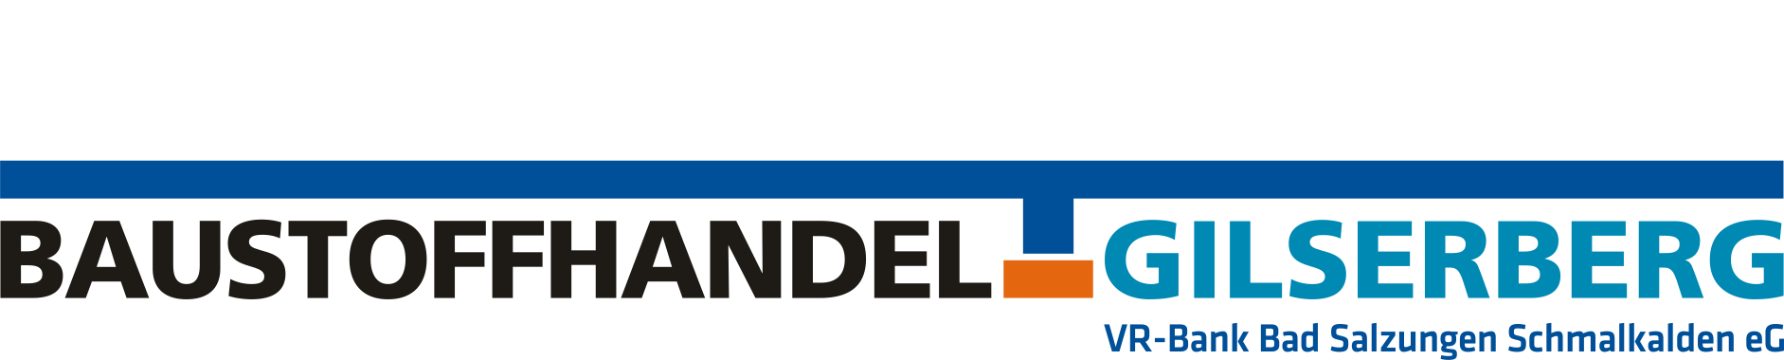 Baustoffhandel Gilserberg